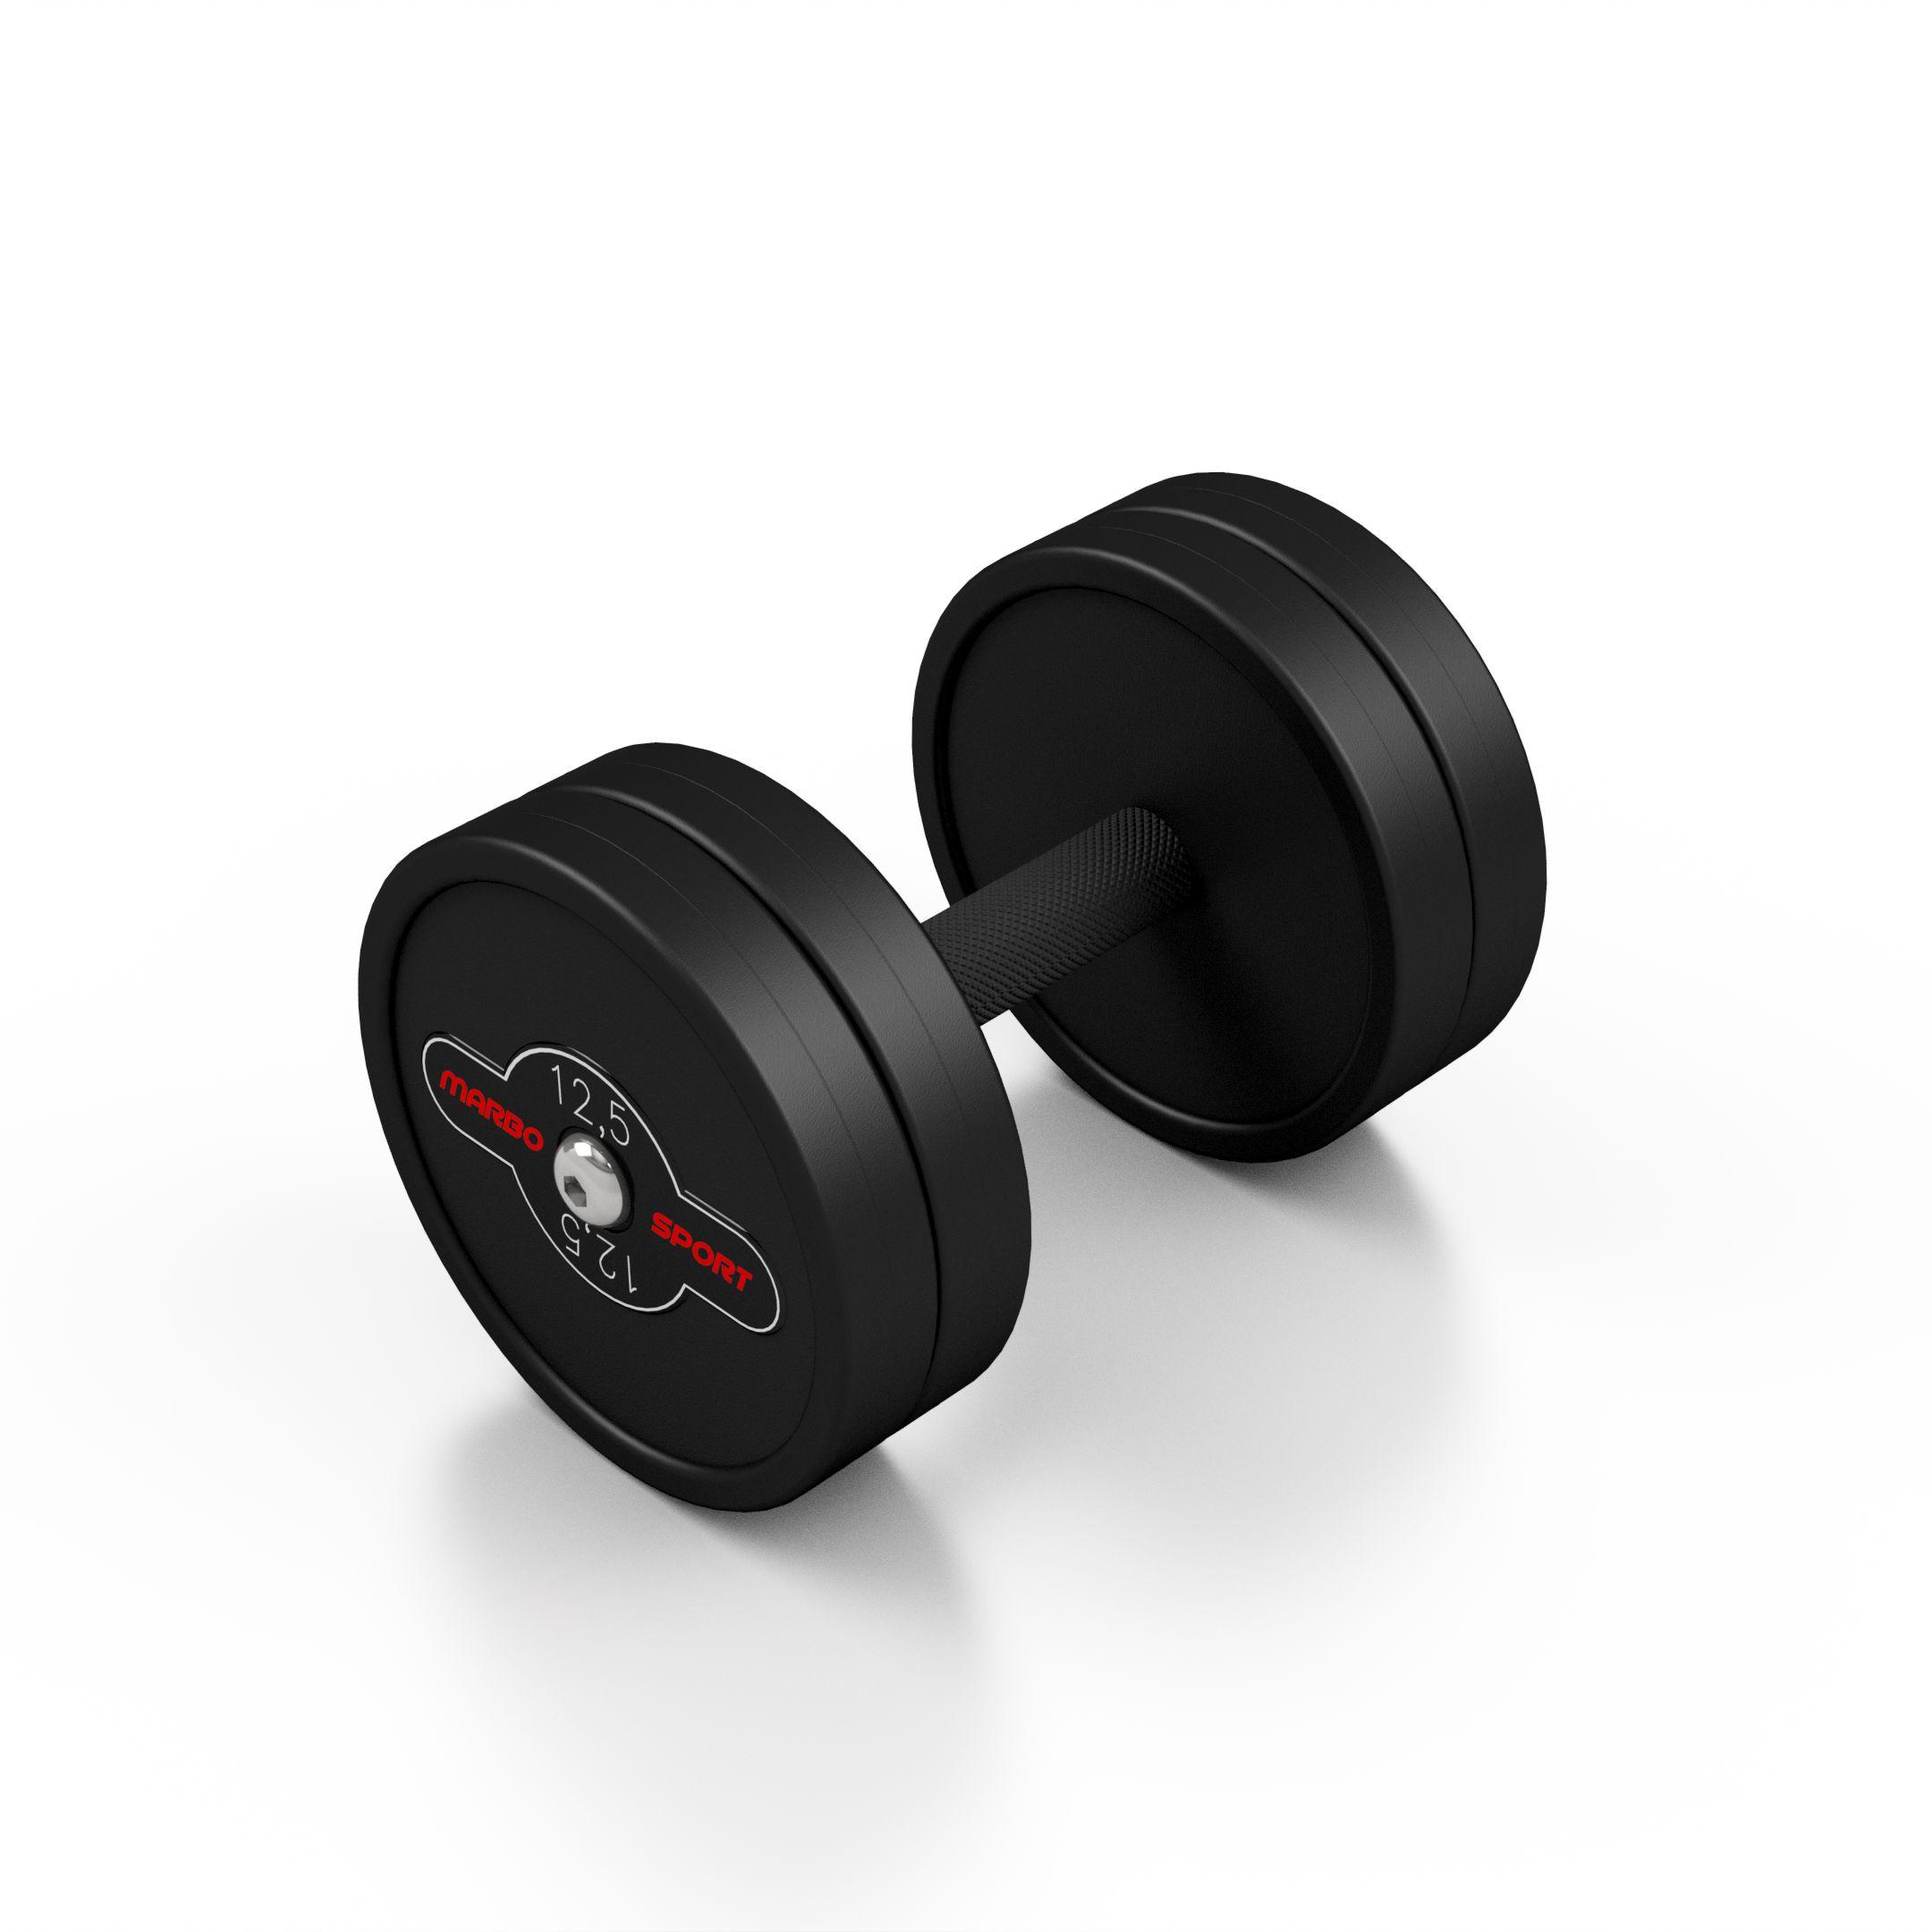 Hantla stalowa gumowana 12,5 kg czarny mat - Marbo Sport - 12,5 kg